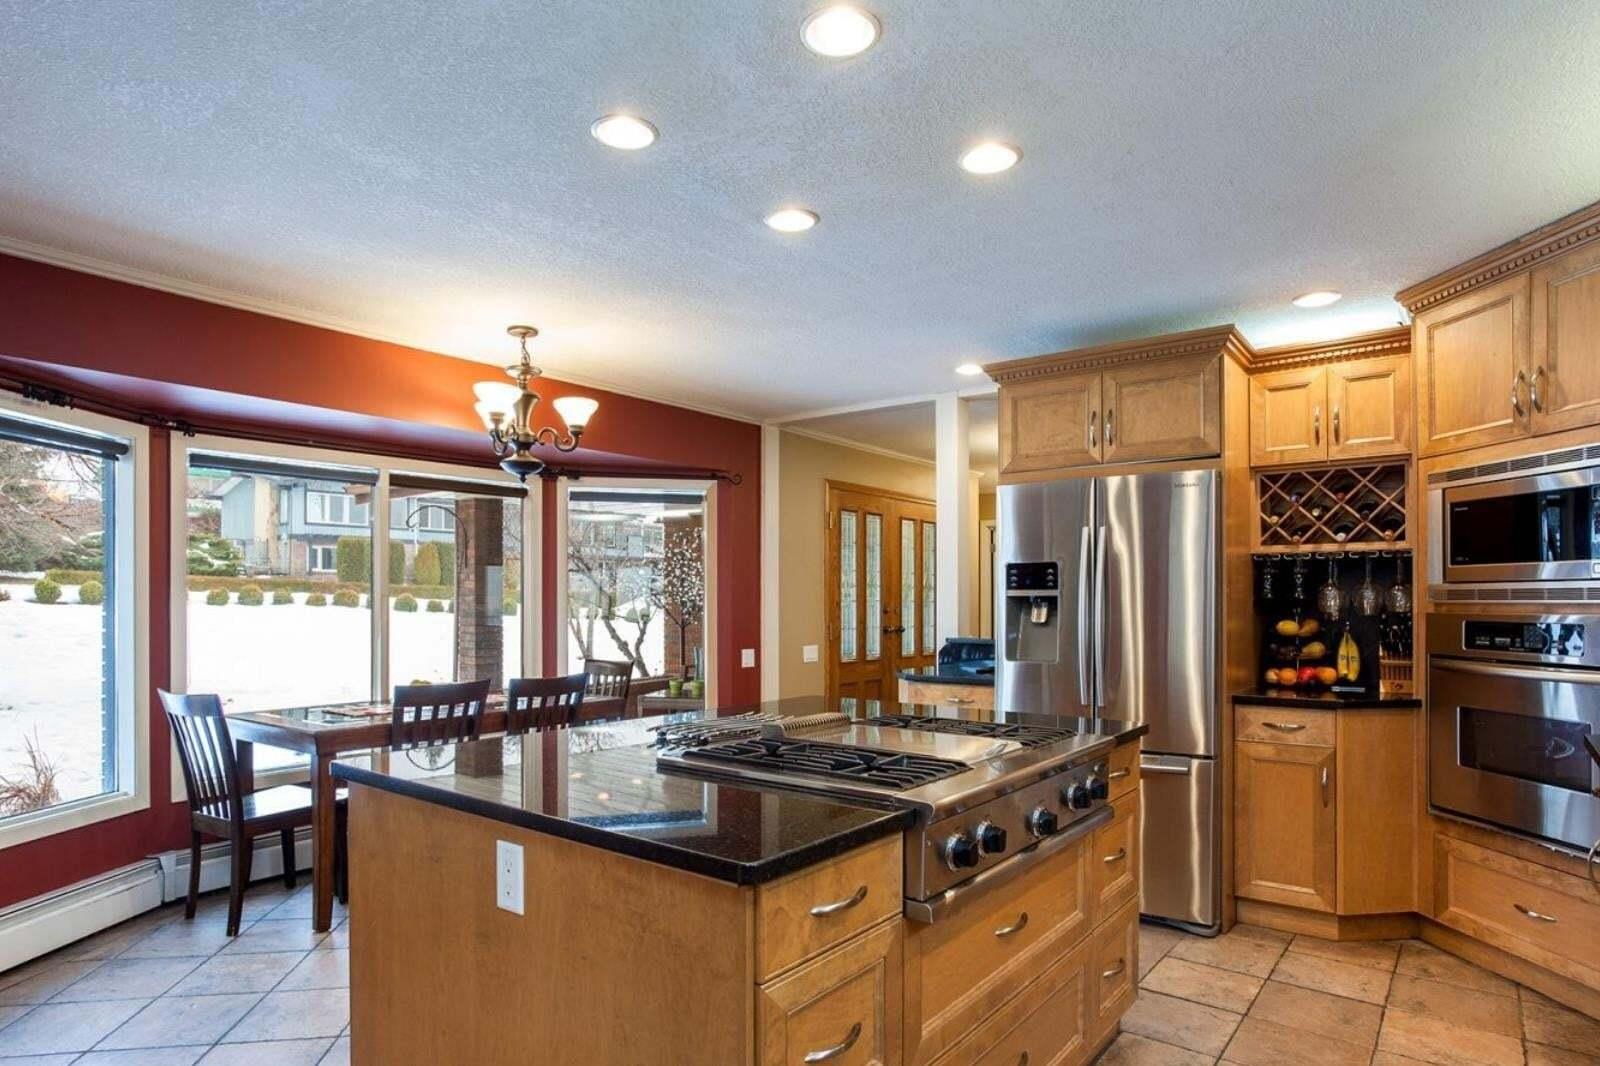 House for sale at 2285 Bridgeview Rd West Kelowna British Columbia - MLS: 10205118